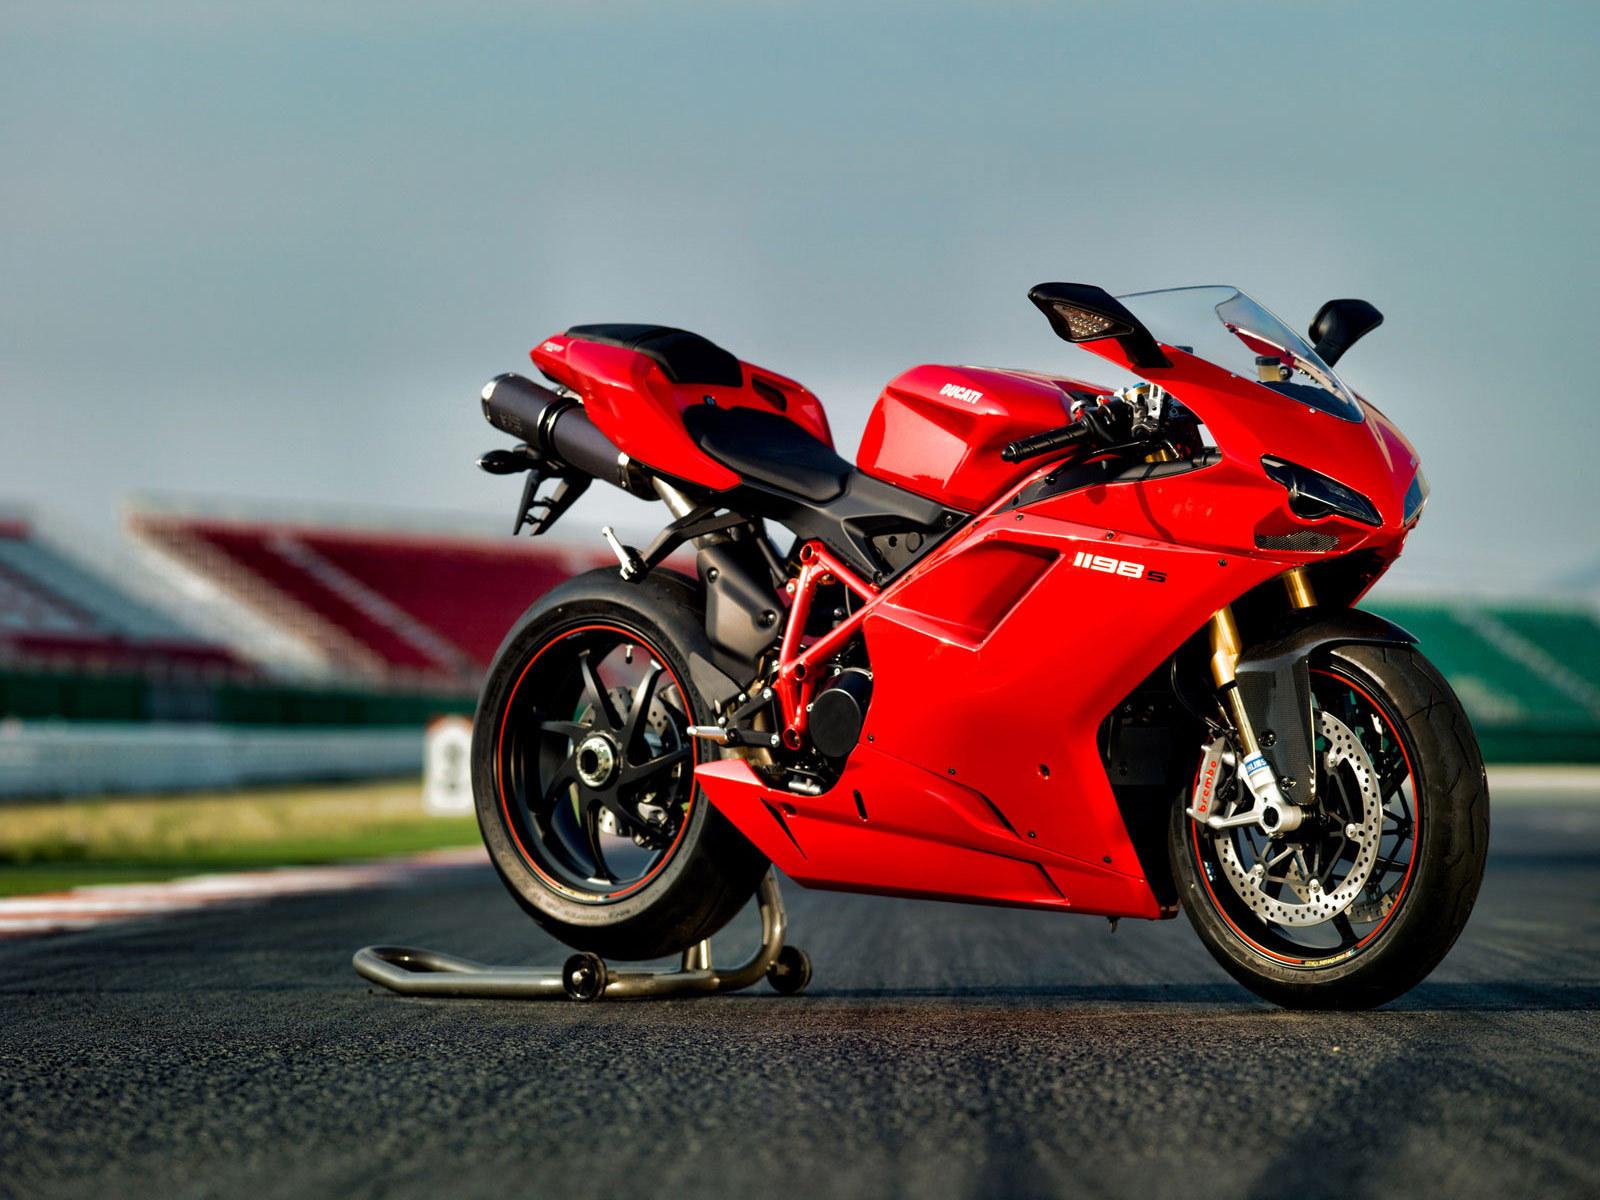 DUCATI 1198S   Motorcycles Wallpaper 26543532 1600x1200